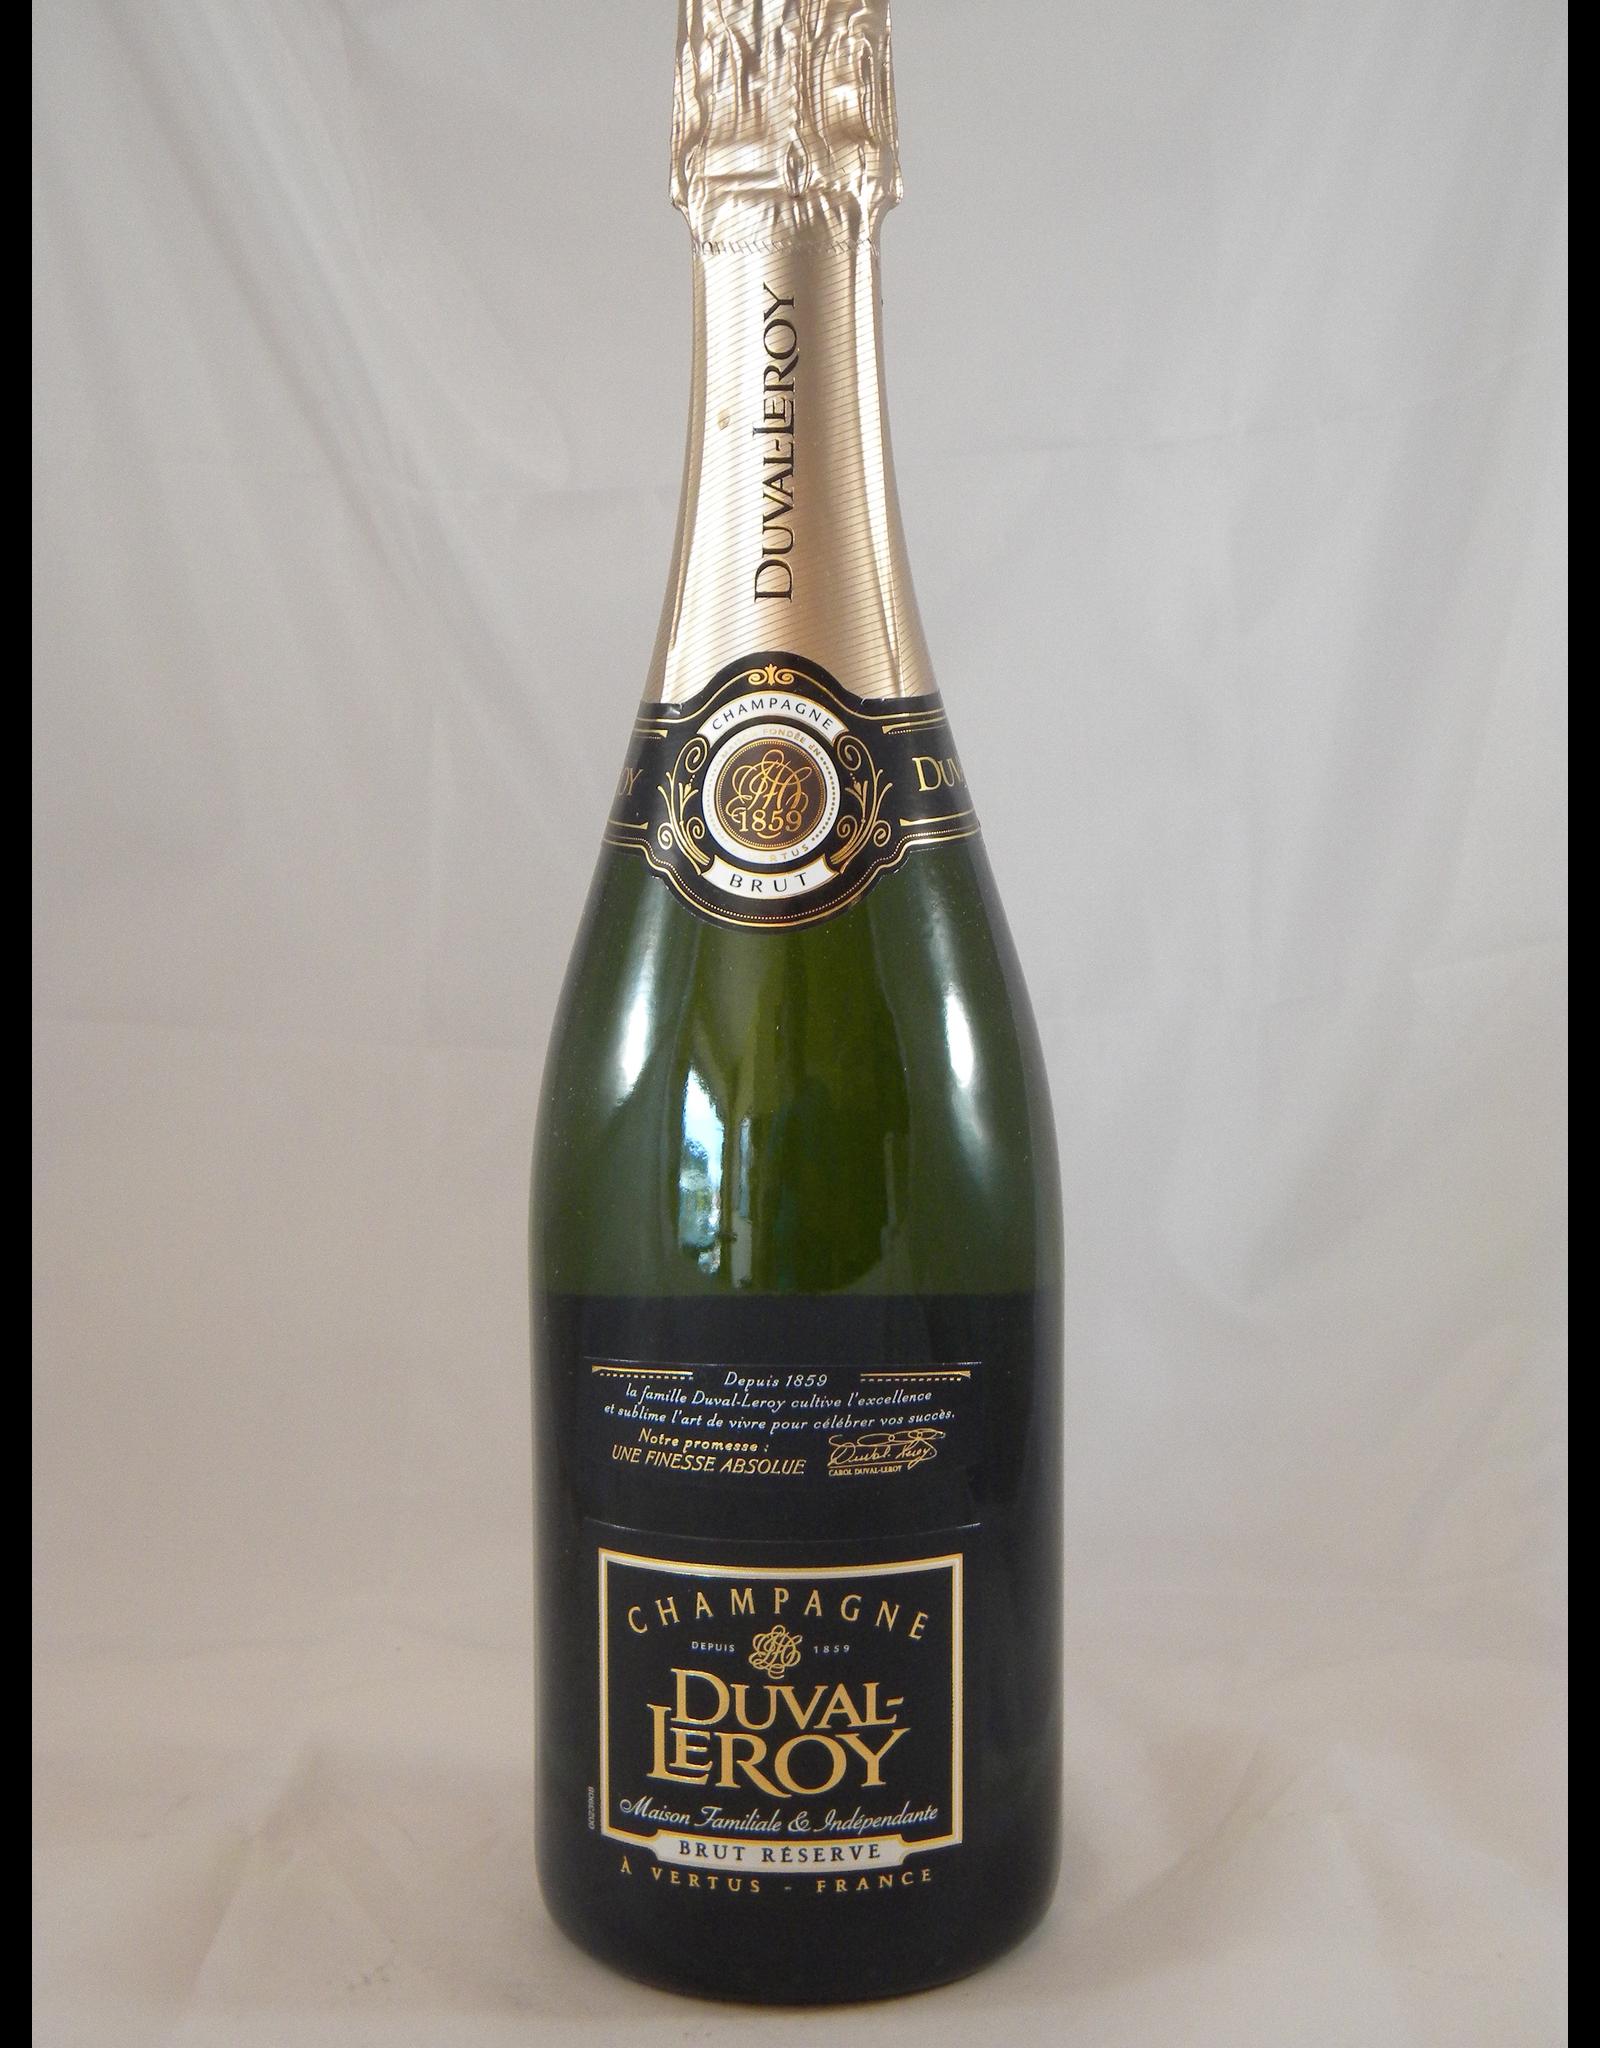 Duval Leroy Champagne Brut Reserve NV